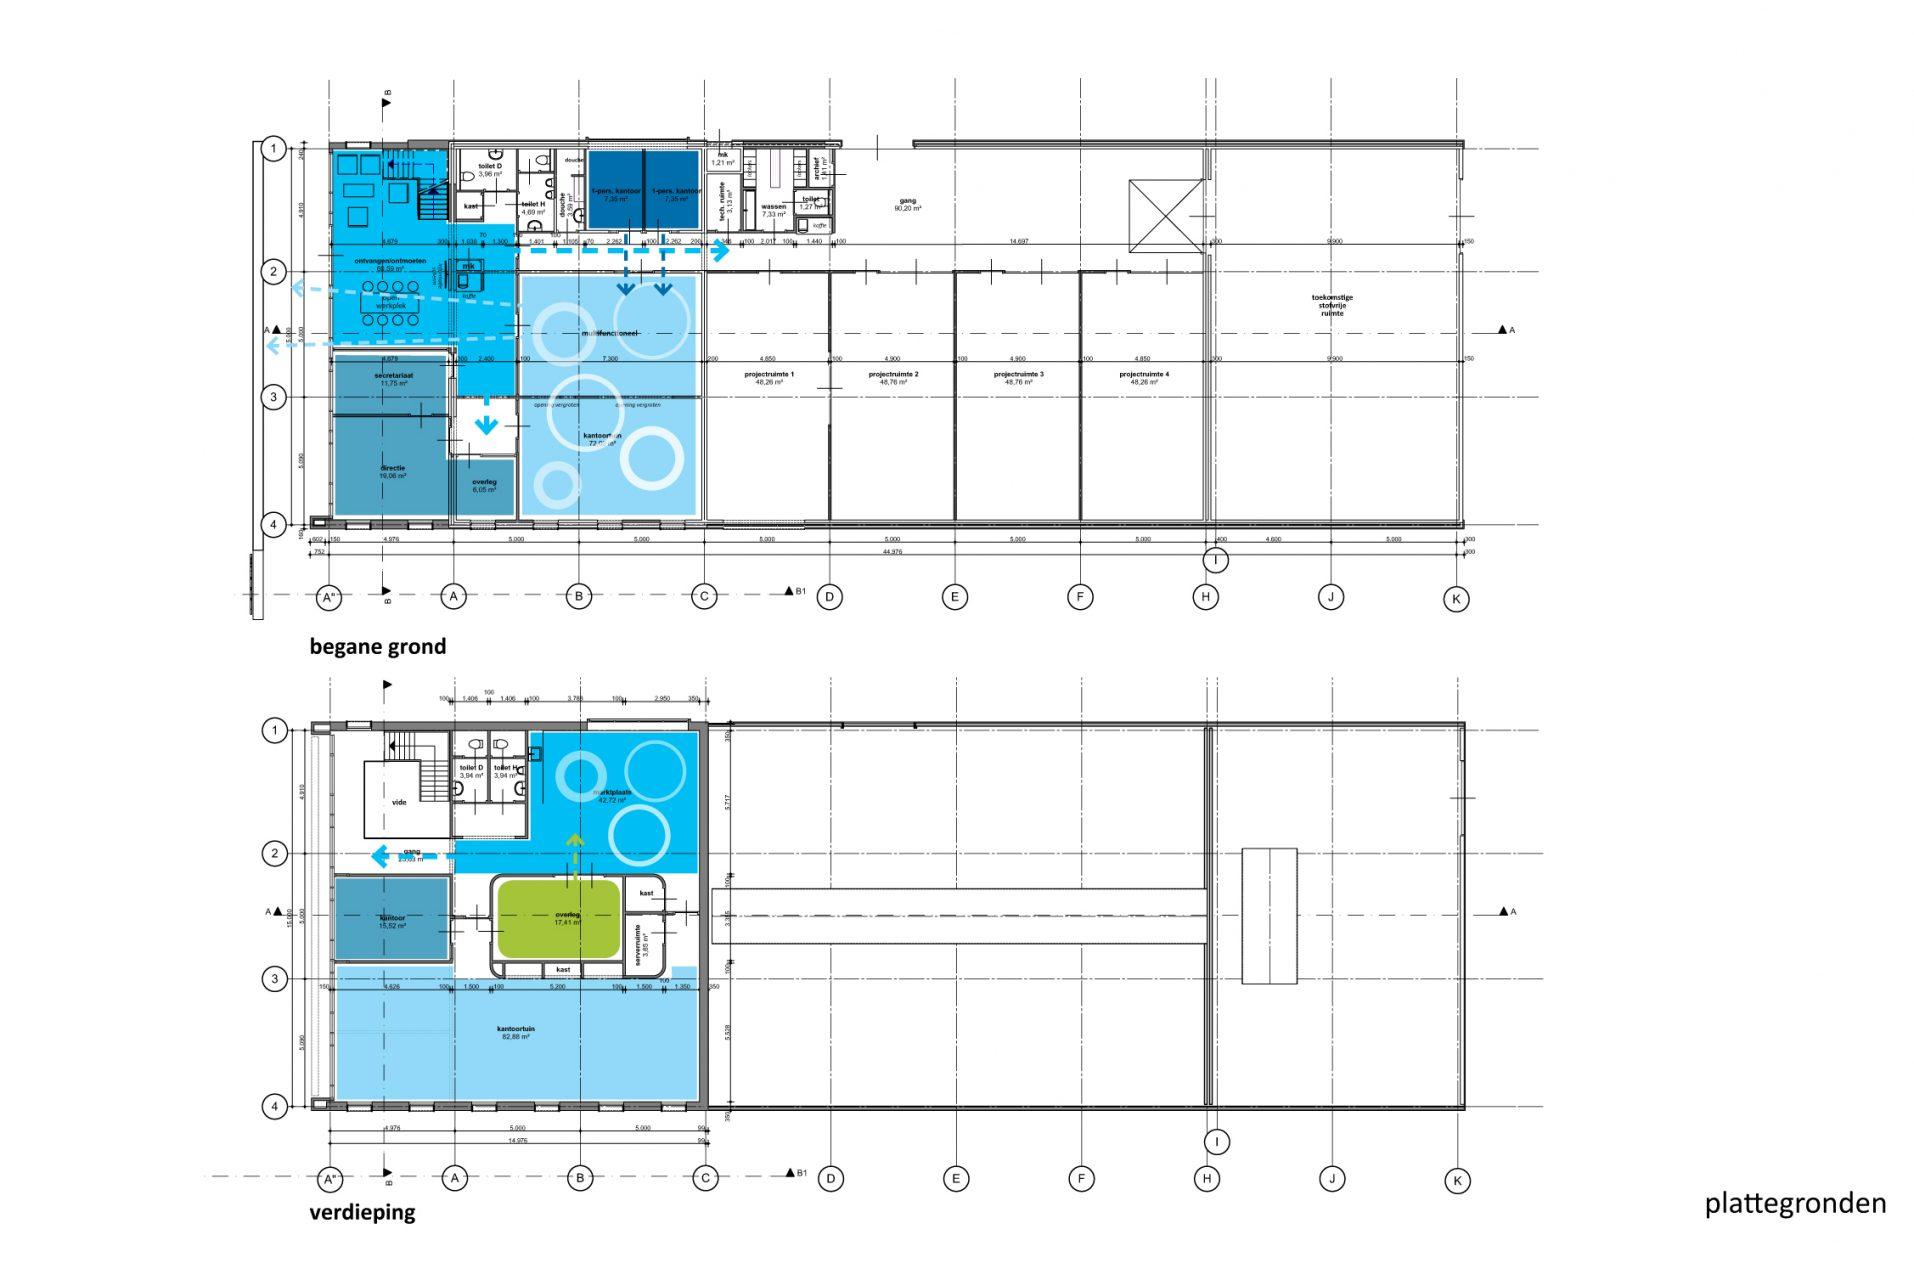 AE-group kantoor+lab plattegronden JYB architecten-06